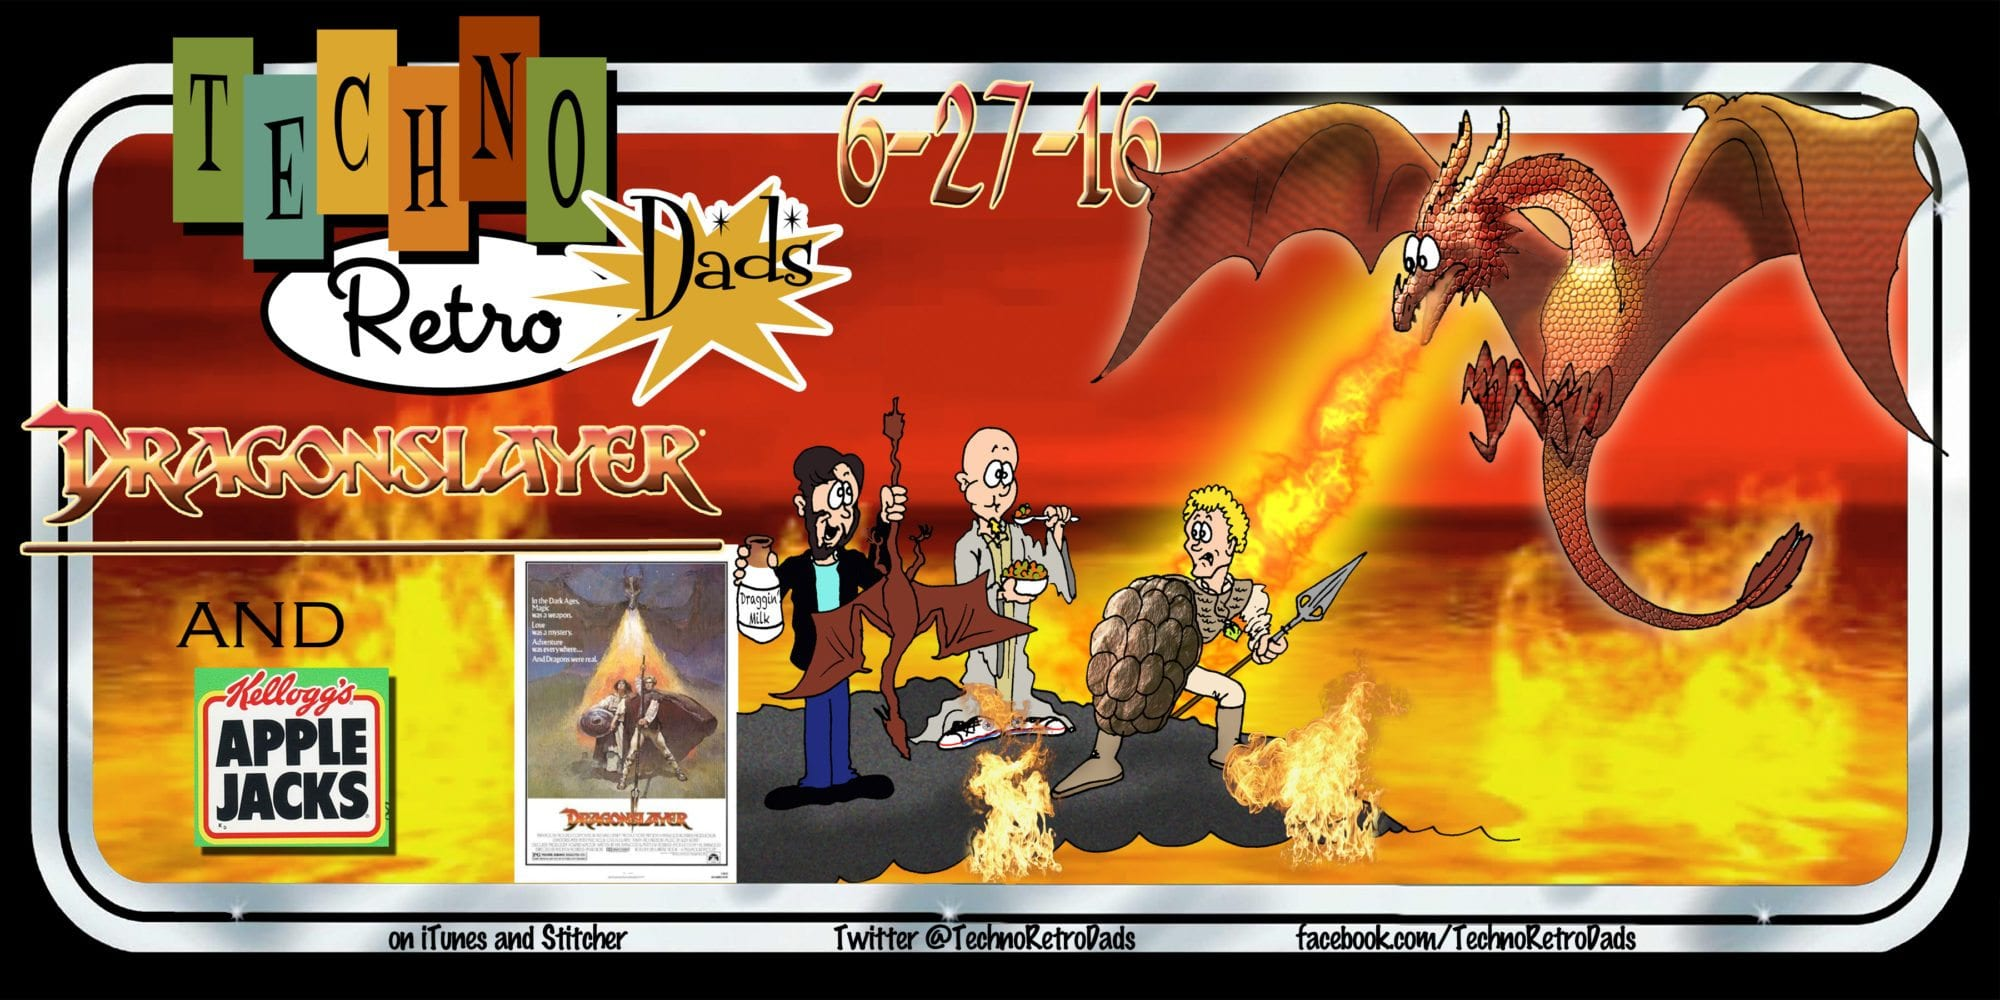 Dragonslayer 1981 TechnoRetro Dads